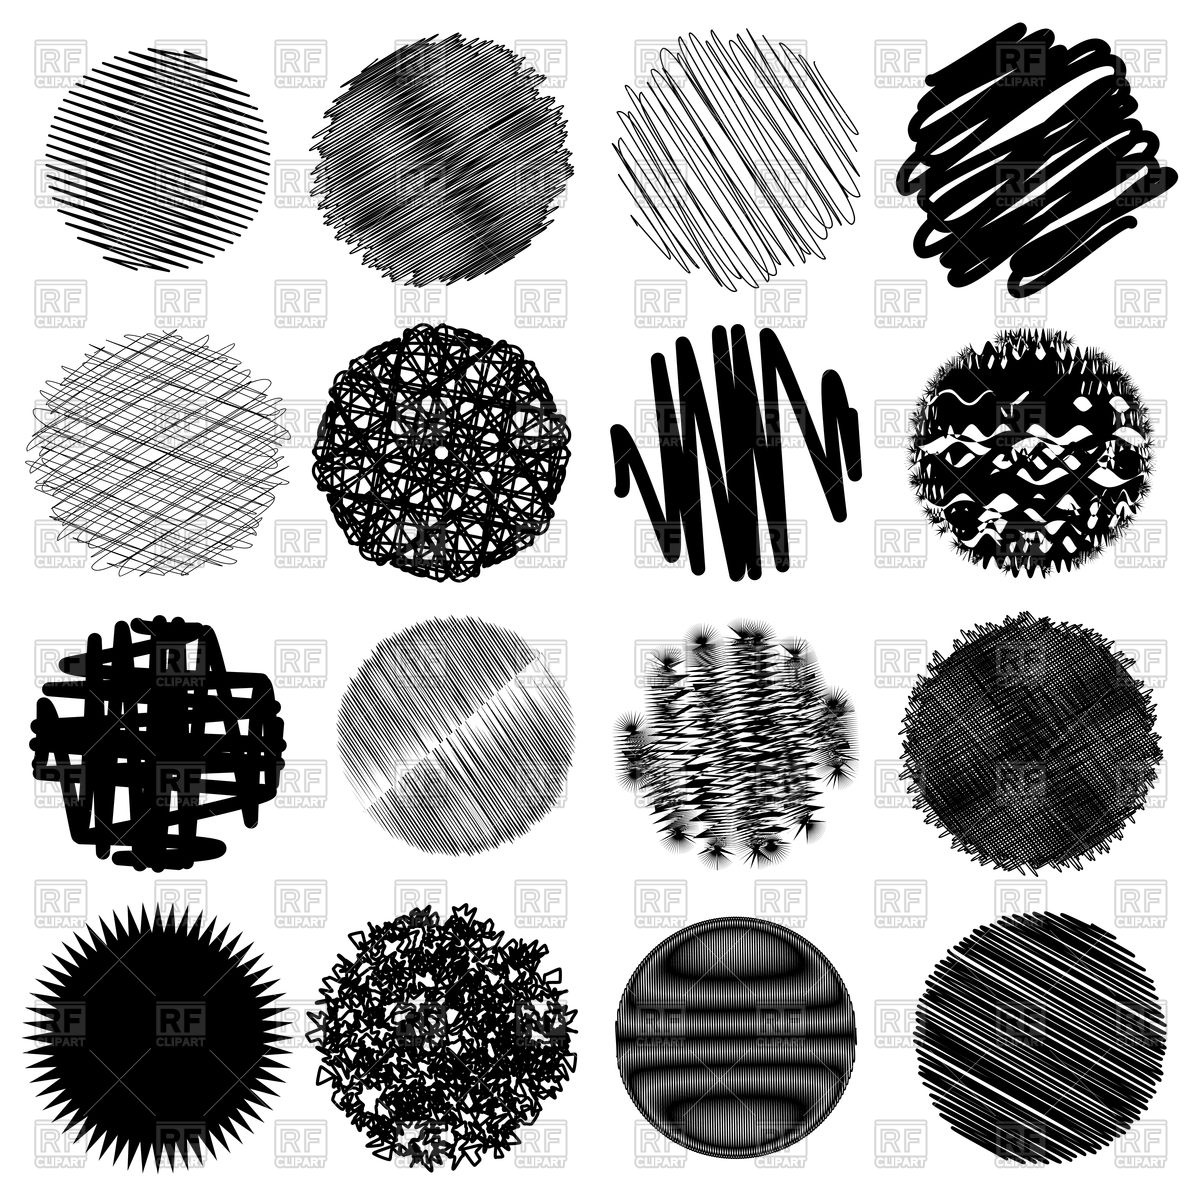 Hand drawn sketch circles with shading fill Vector Image #90797.